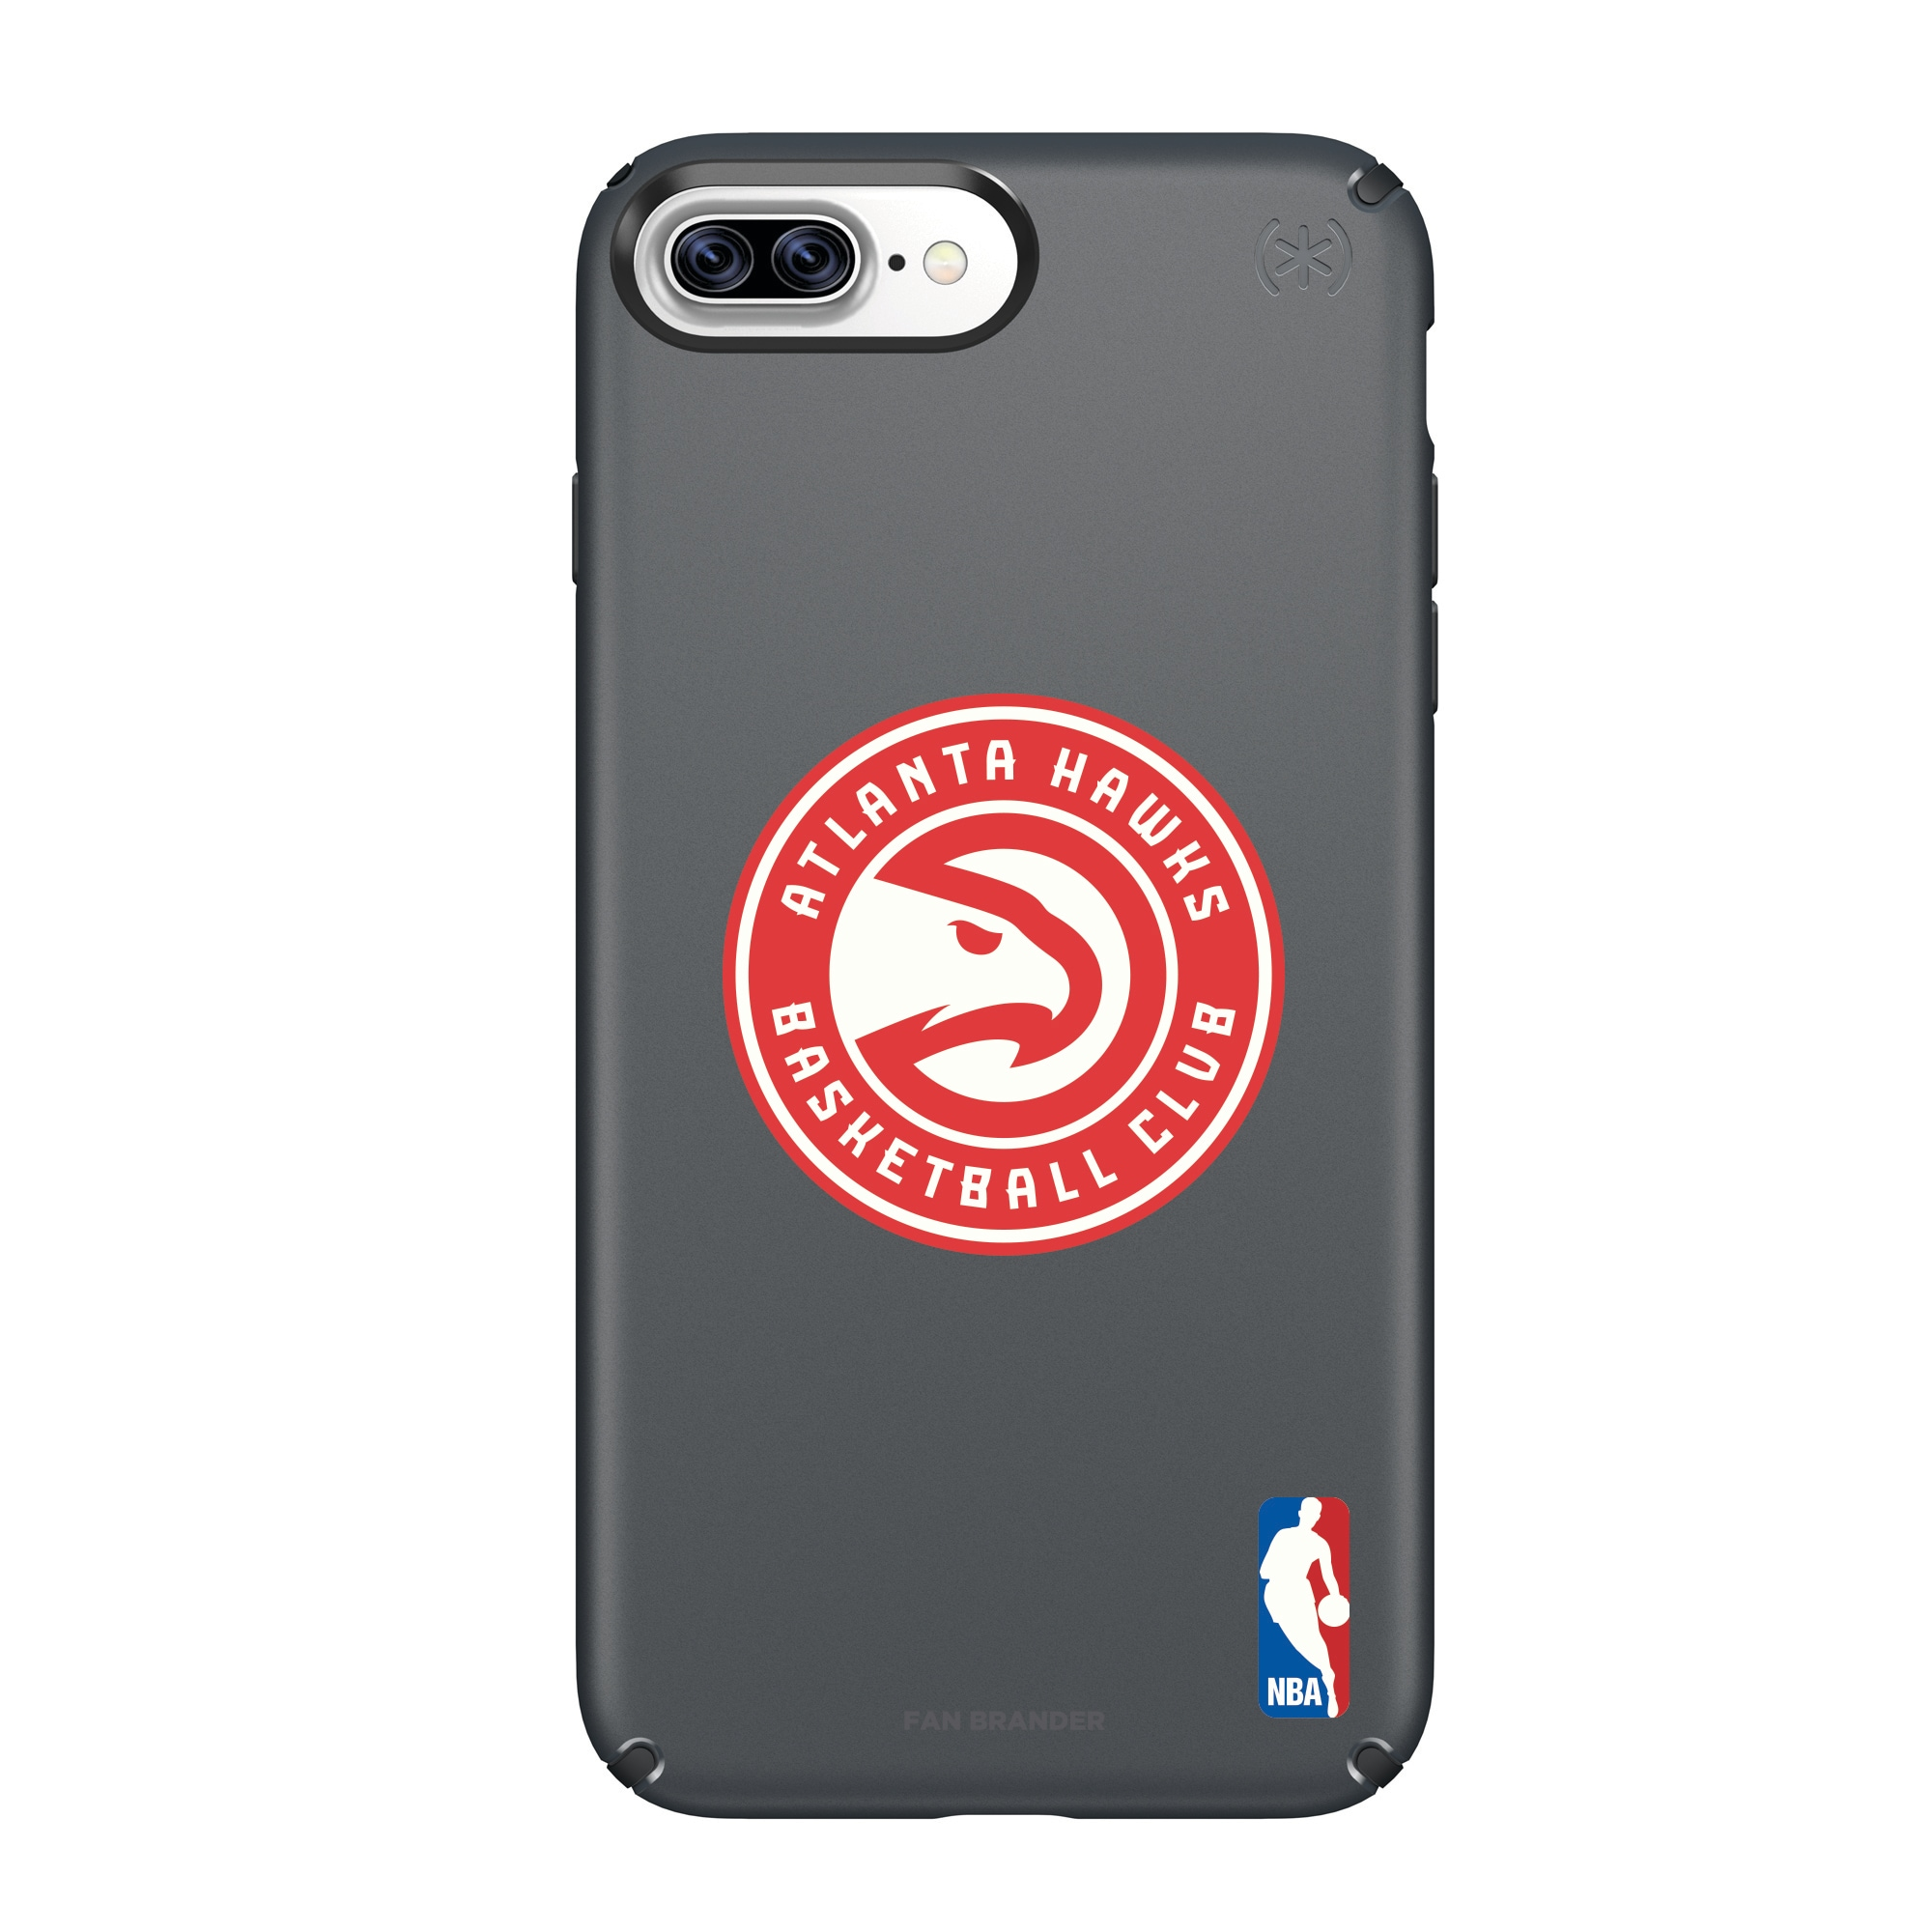 Atlanta Hawks Speck Primary Logo iPhone Case - Black